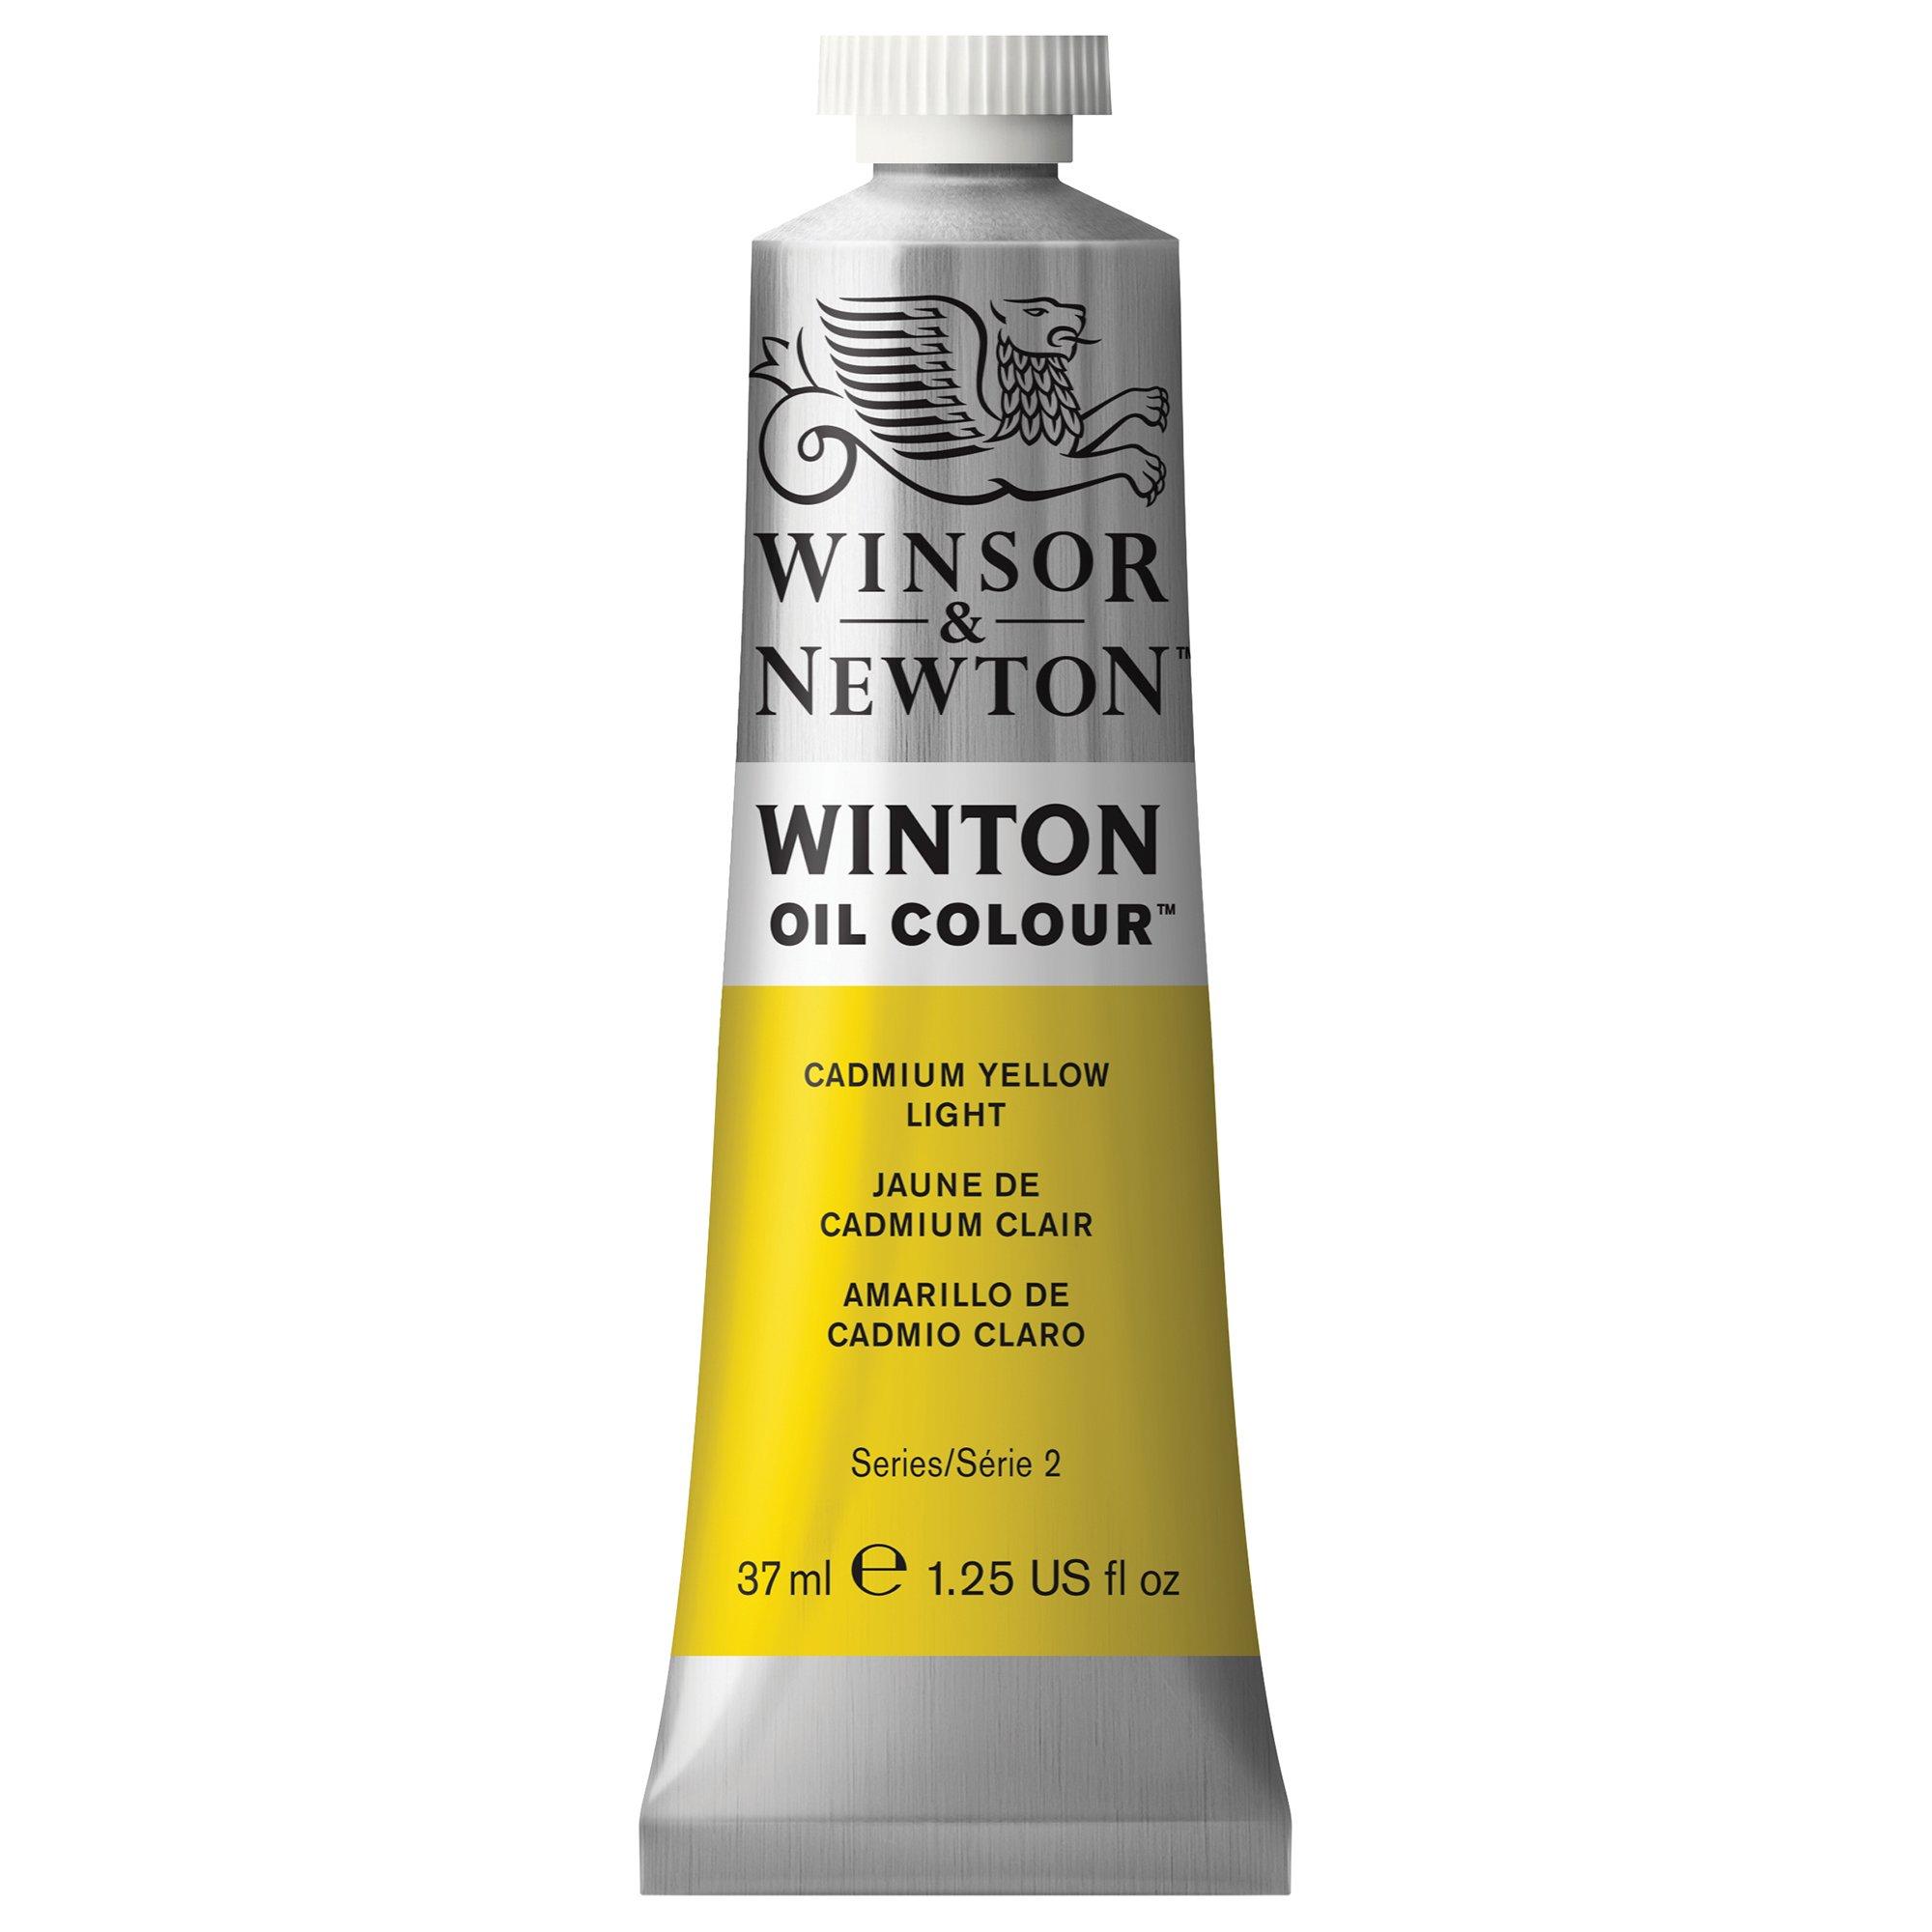 Winsor & Newton Winton Oil Colour Paint, 37ml tube, Cadmium Yellow Light